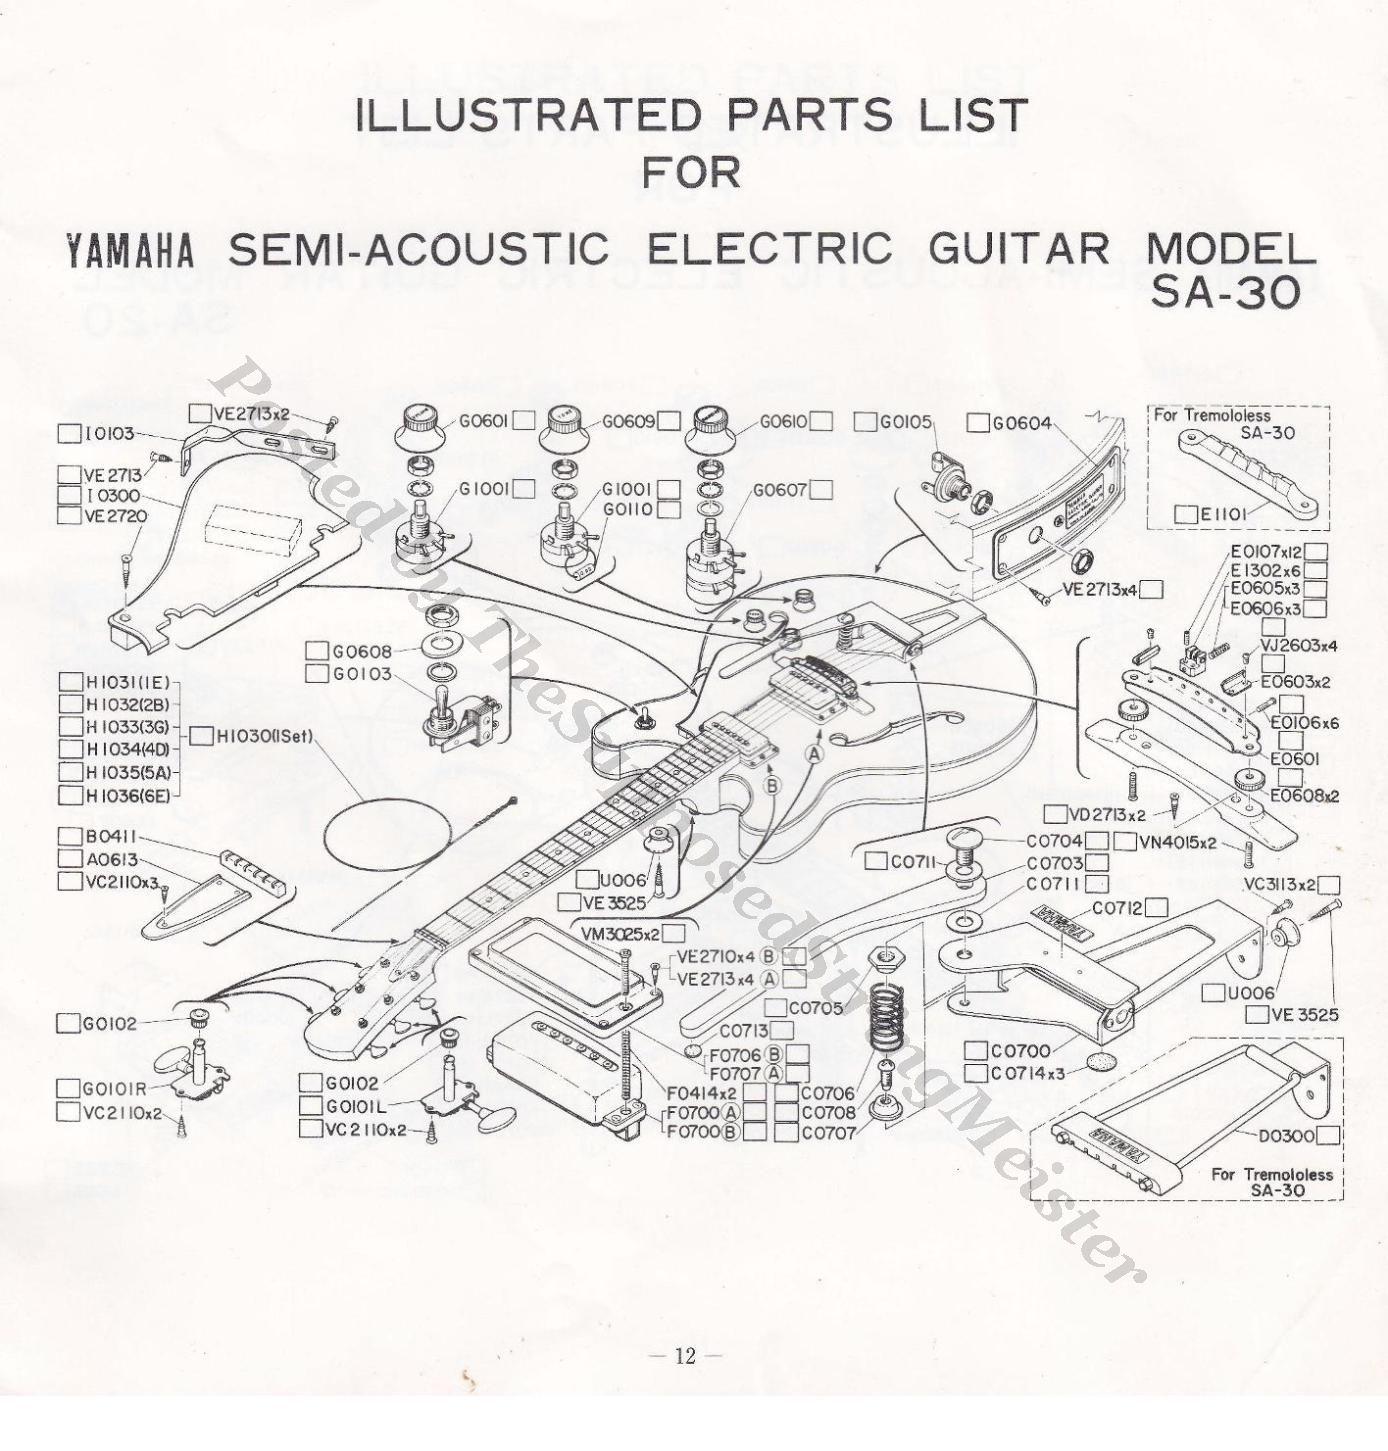 sa 30 yamaha guitar booklet page 12 illustrated parts list 1388 1451 yamaha catalog. Black Bedroom Furniture Sets. Home Design Ideas